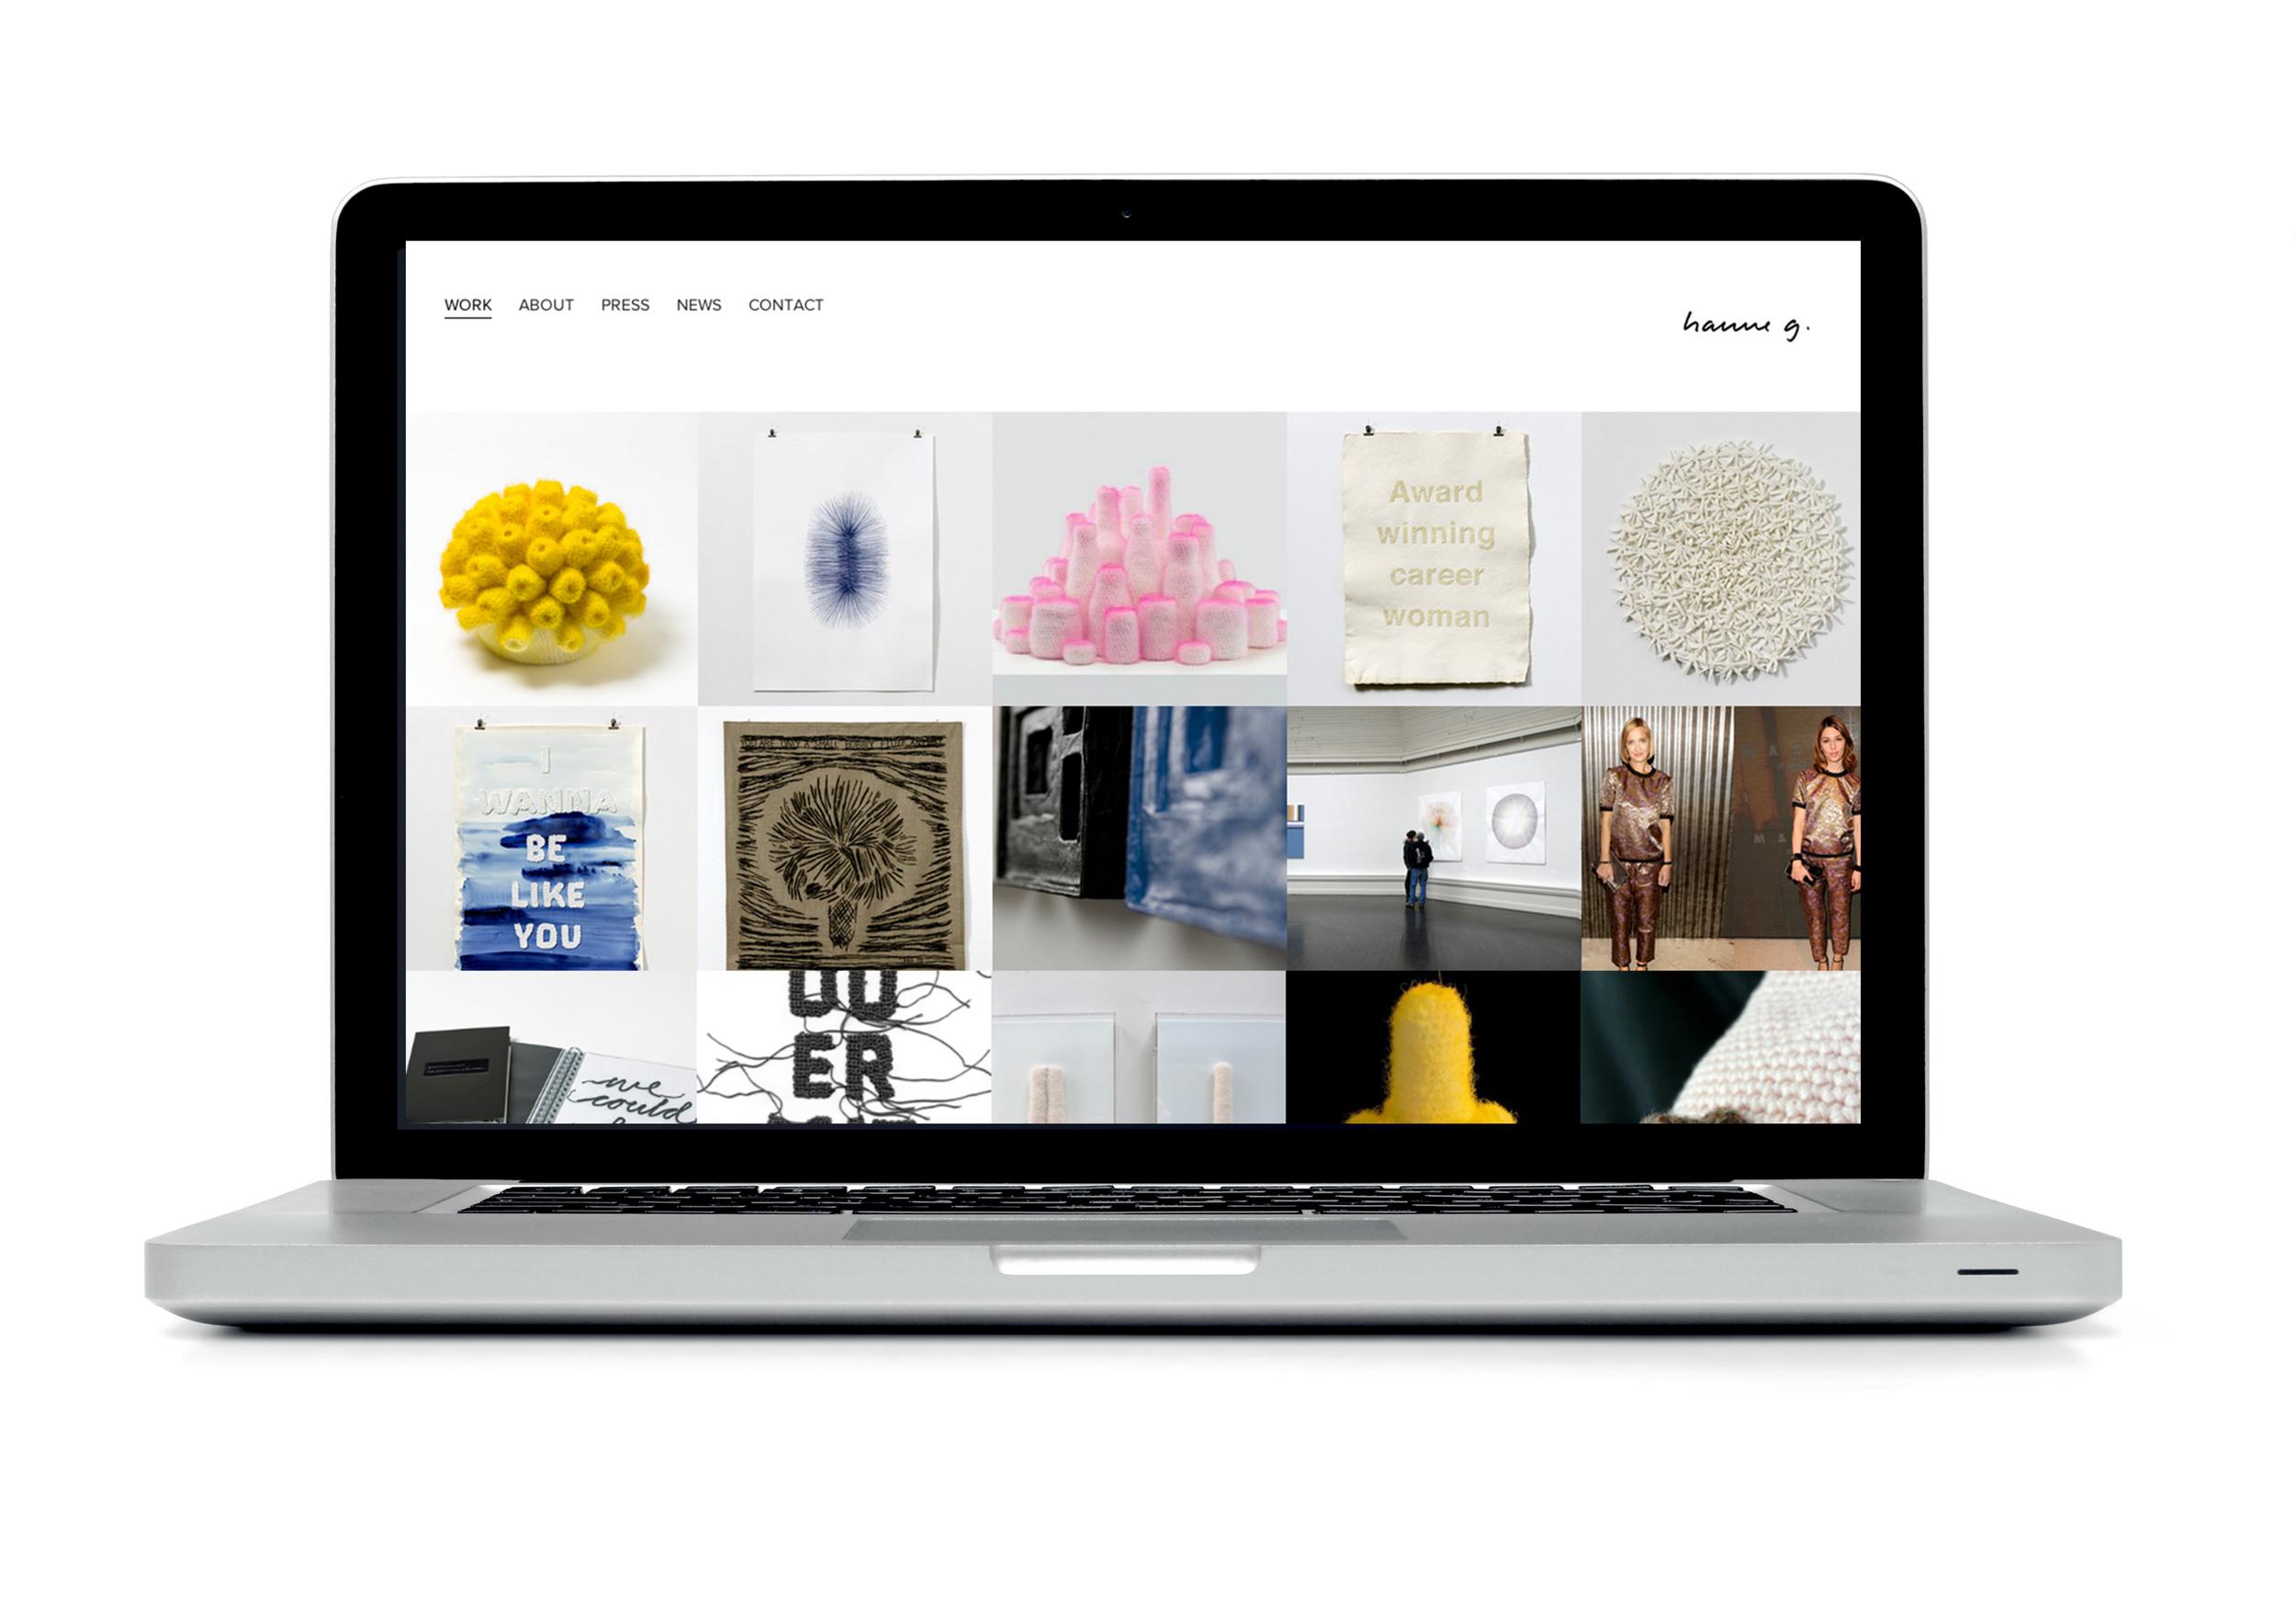 Website design for artist Hanne G  See site at:  www.hanneg.dk